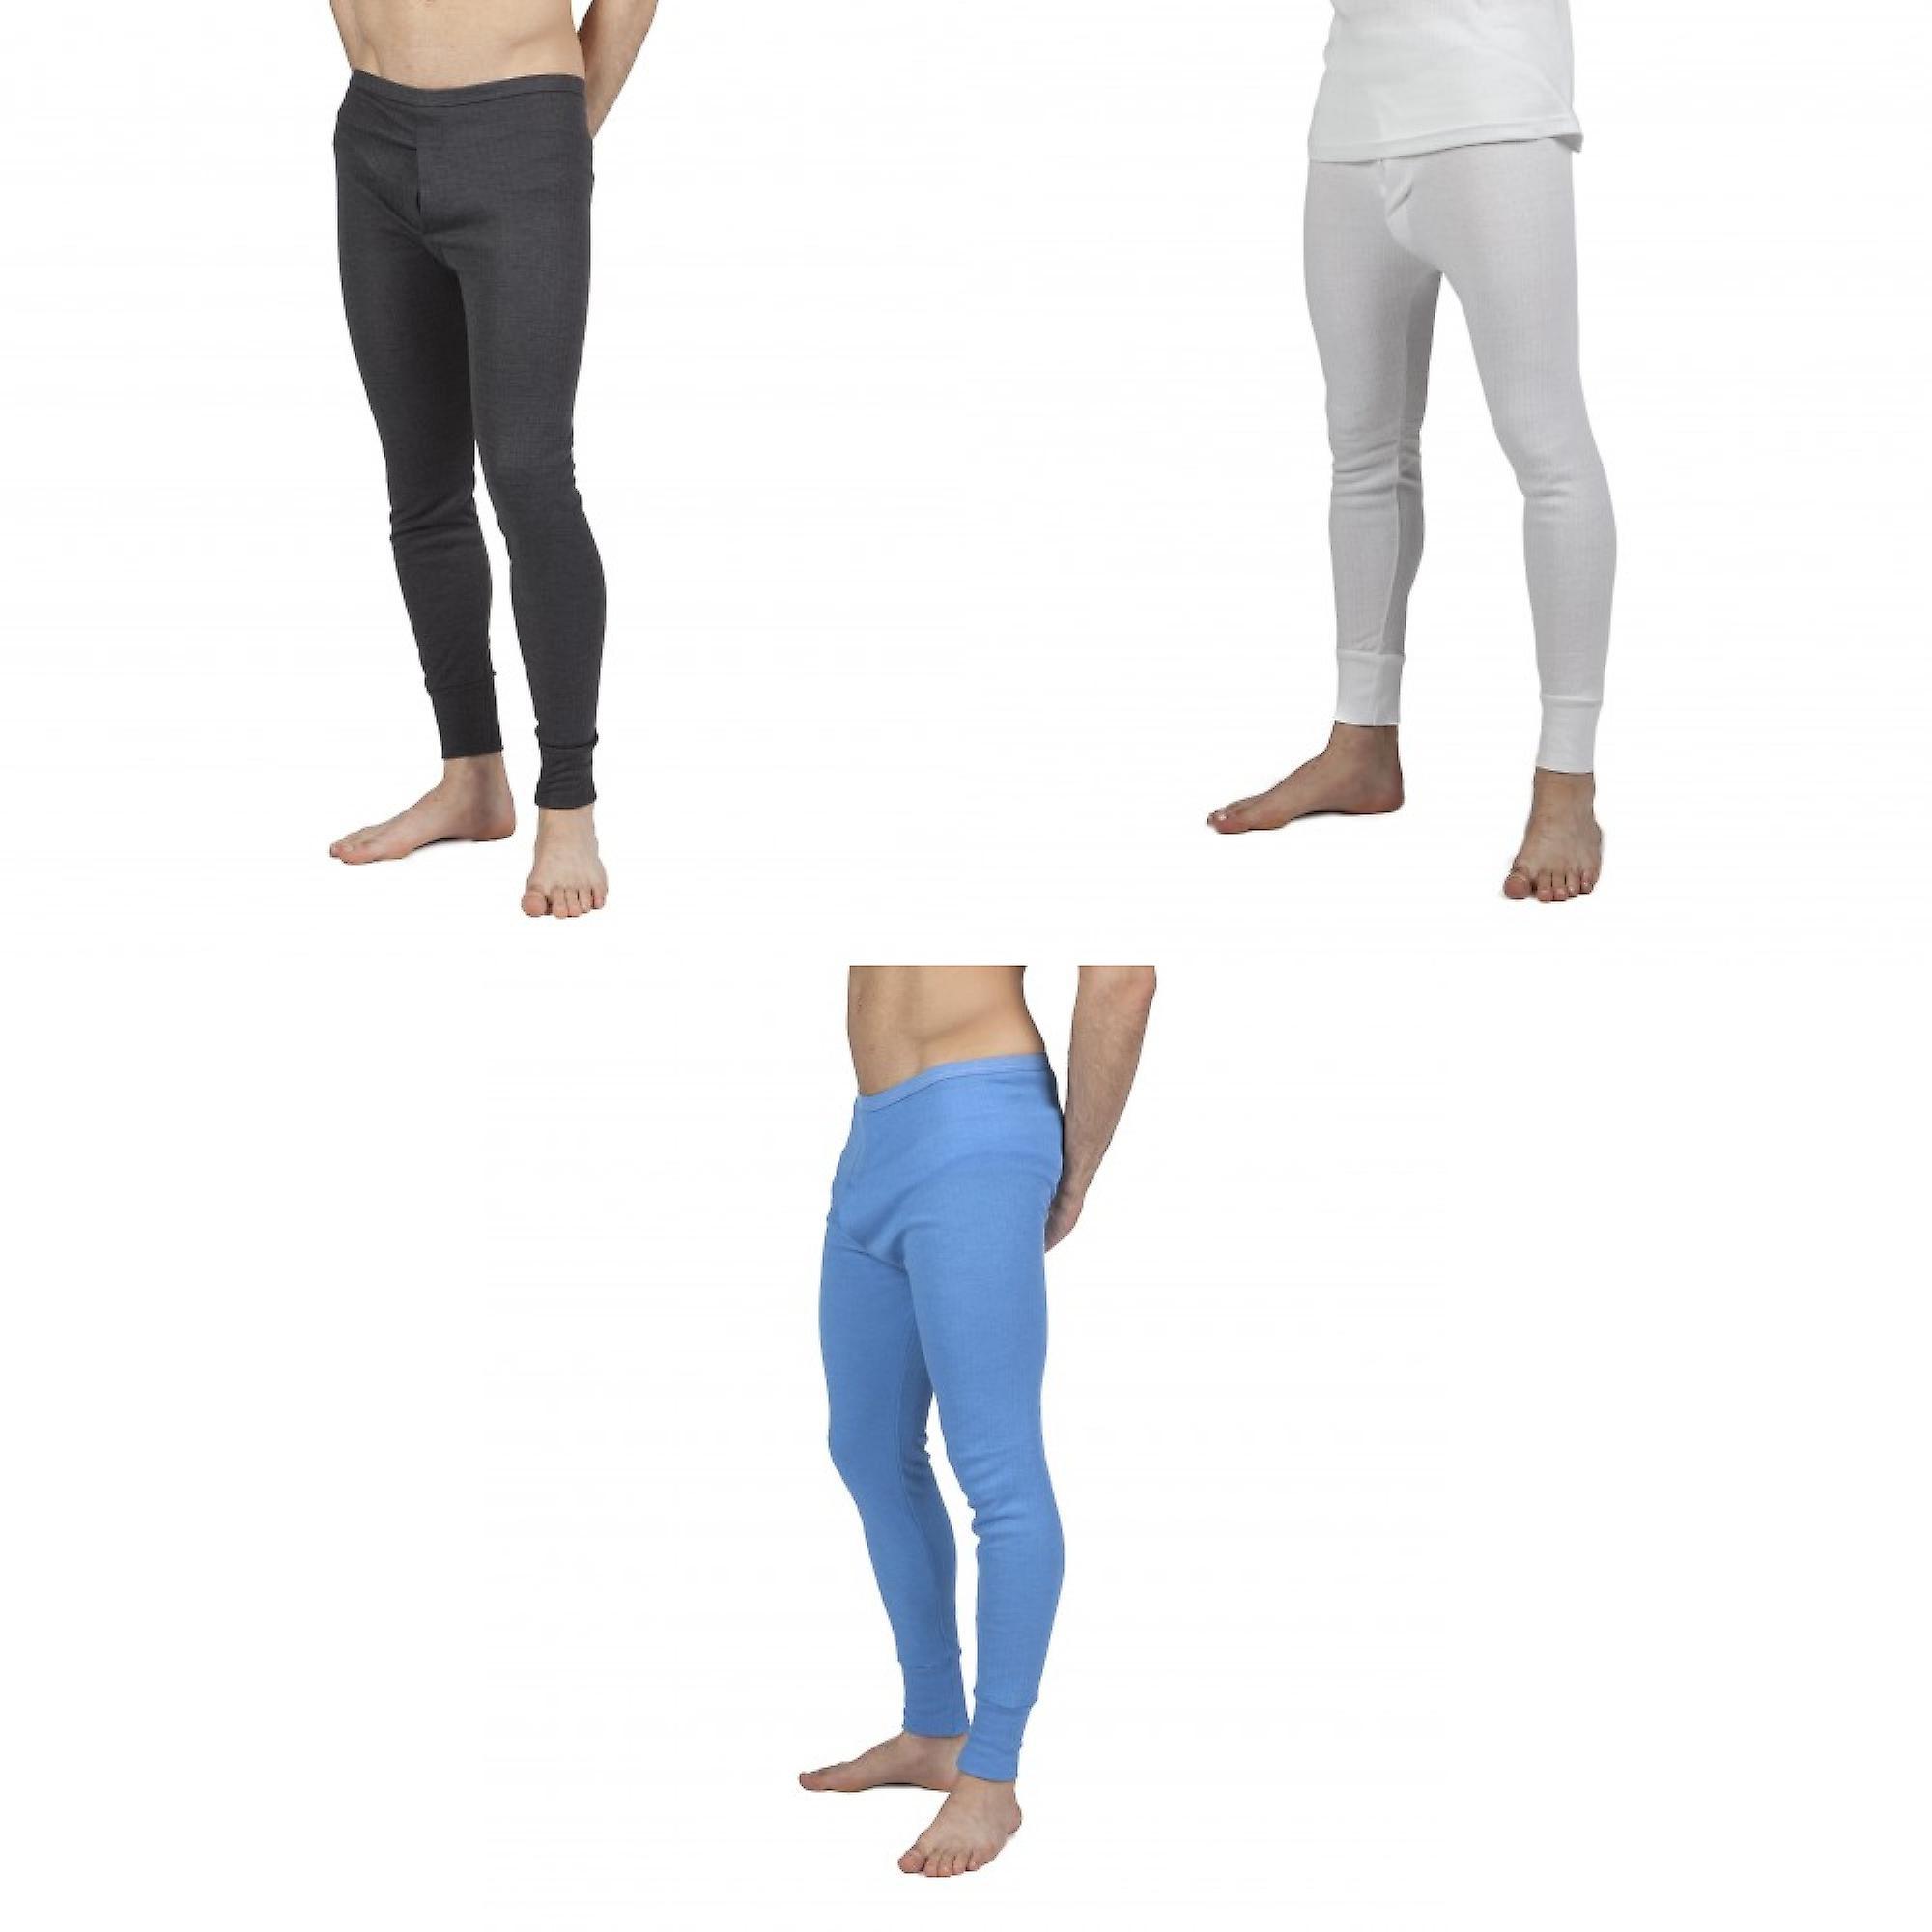 Pantaloni finta pelle Bagnato aderenti Lacci Stringhe Faux Leather Leggings R